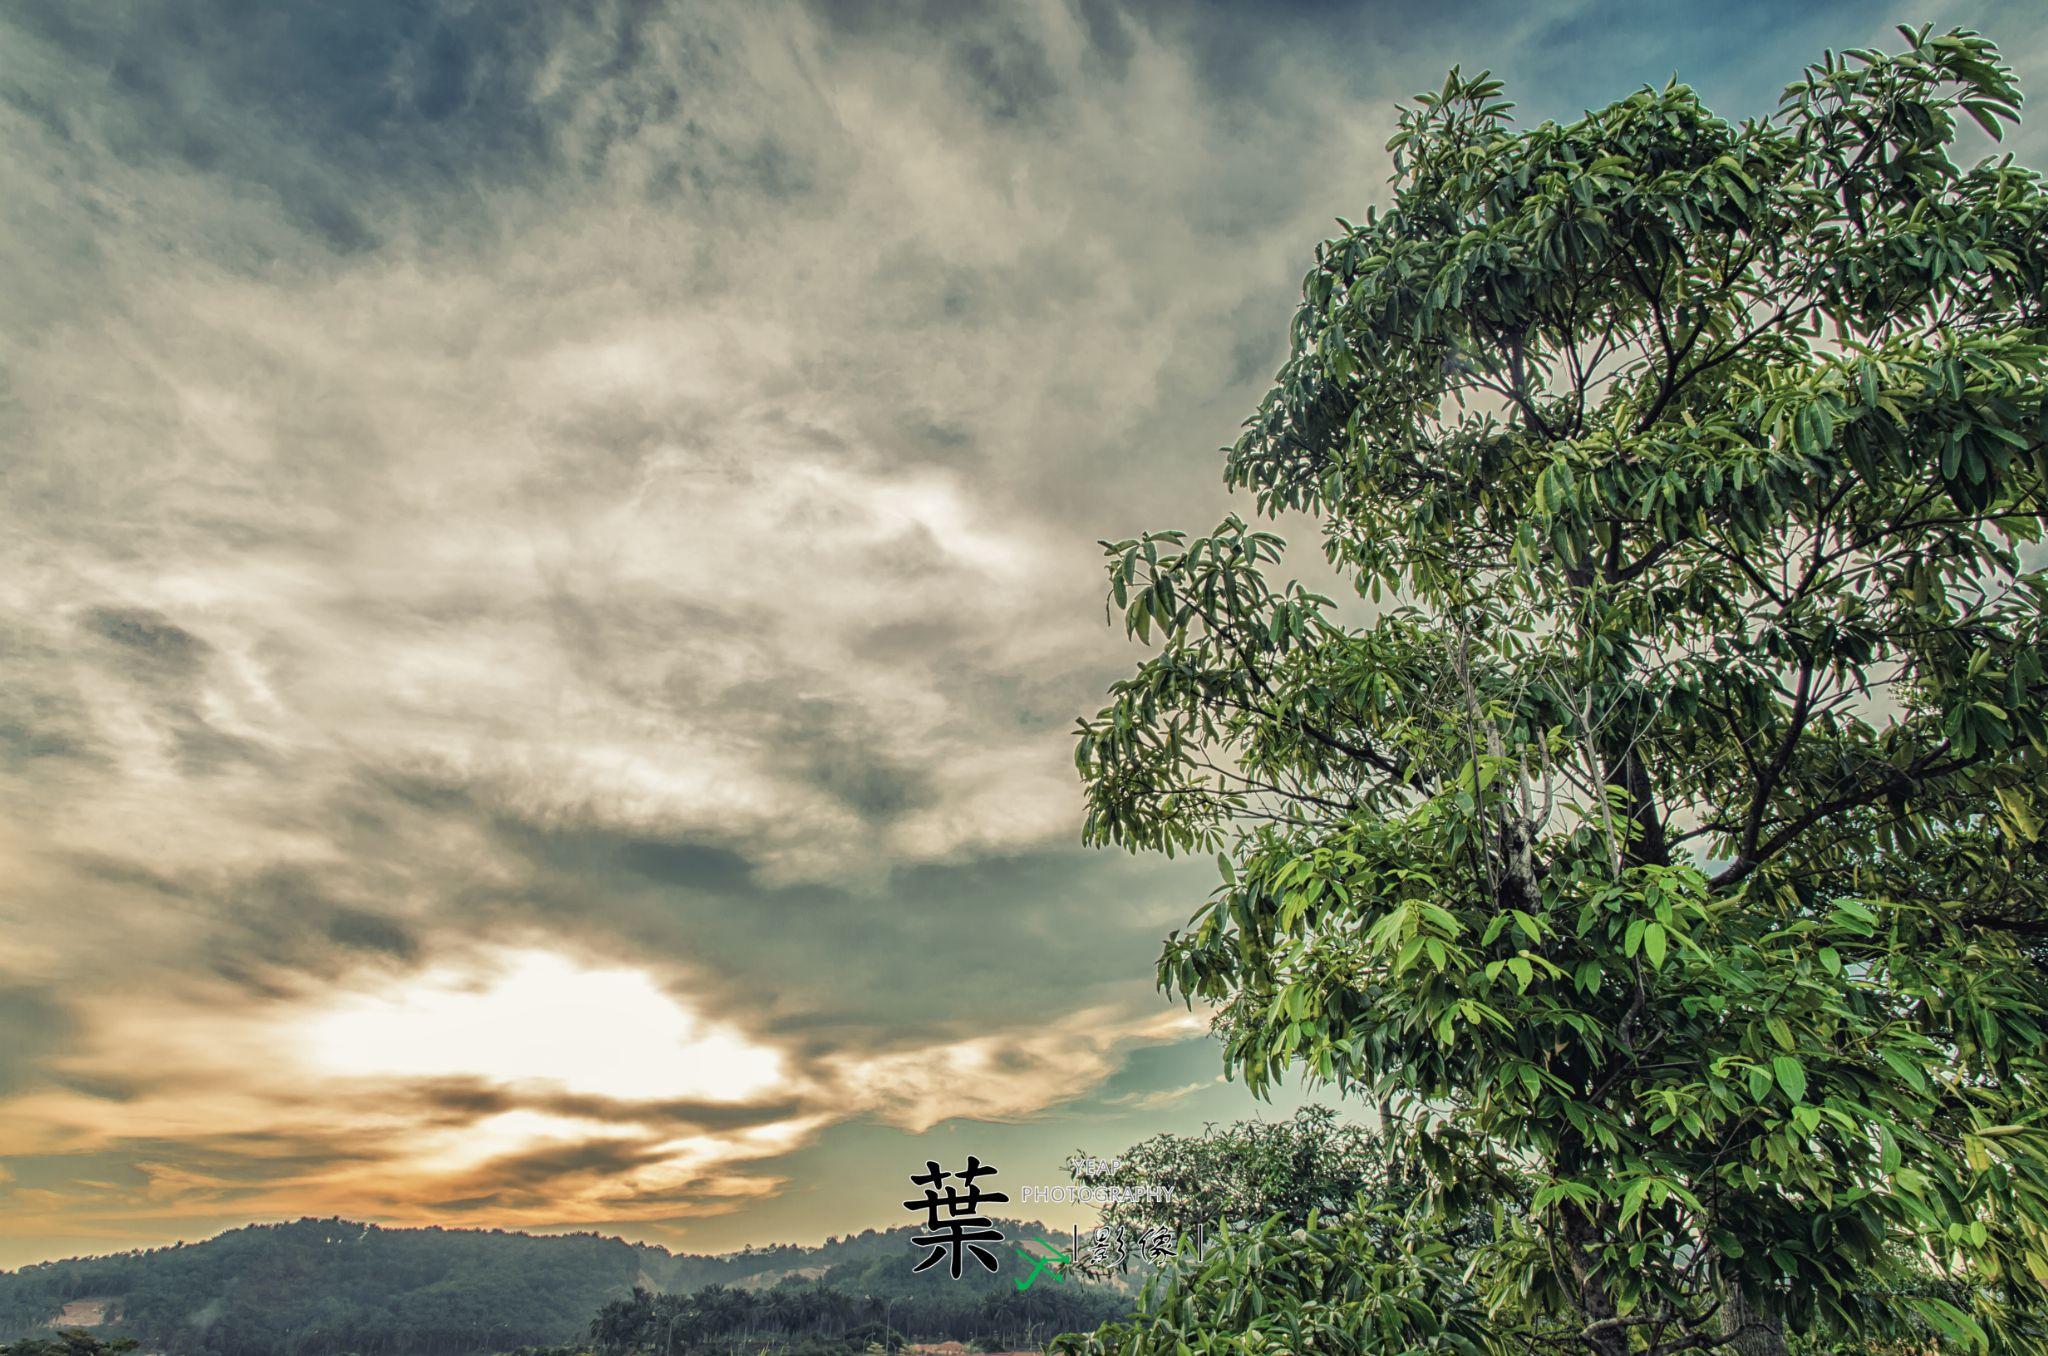 Untitled by Chun Siang Yeap